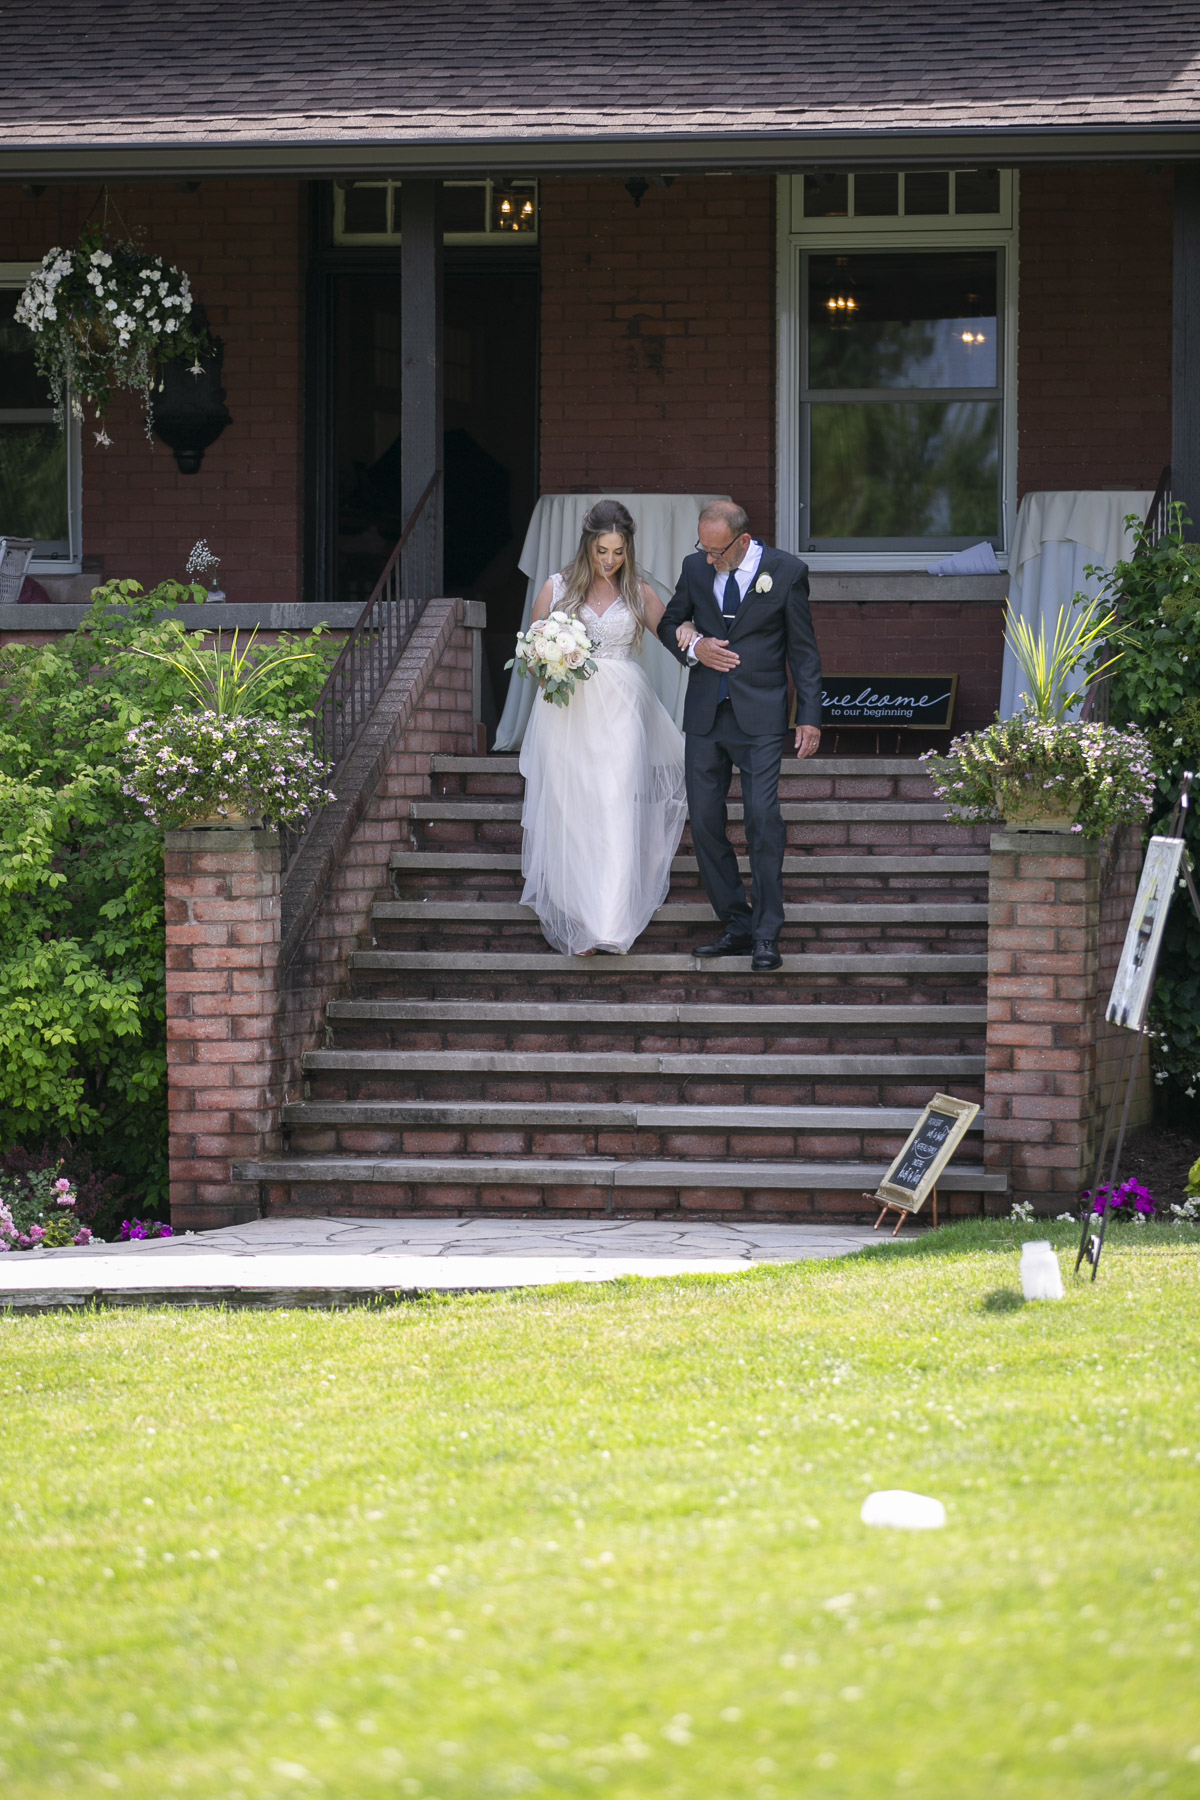 vineyard-bride-philosophy-studios-outdoor-summer-wedding-the-tamahaac-club-niagara-ancaster-toronto-vendor-0074.JPG